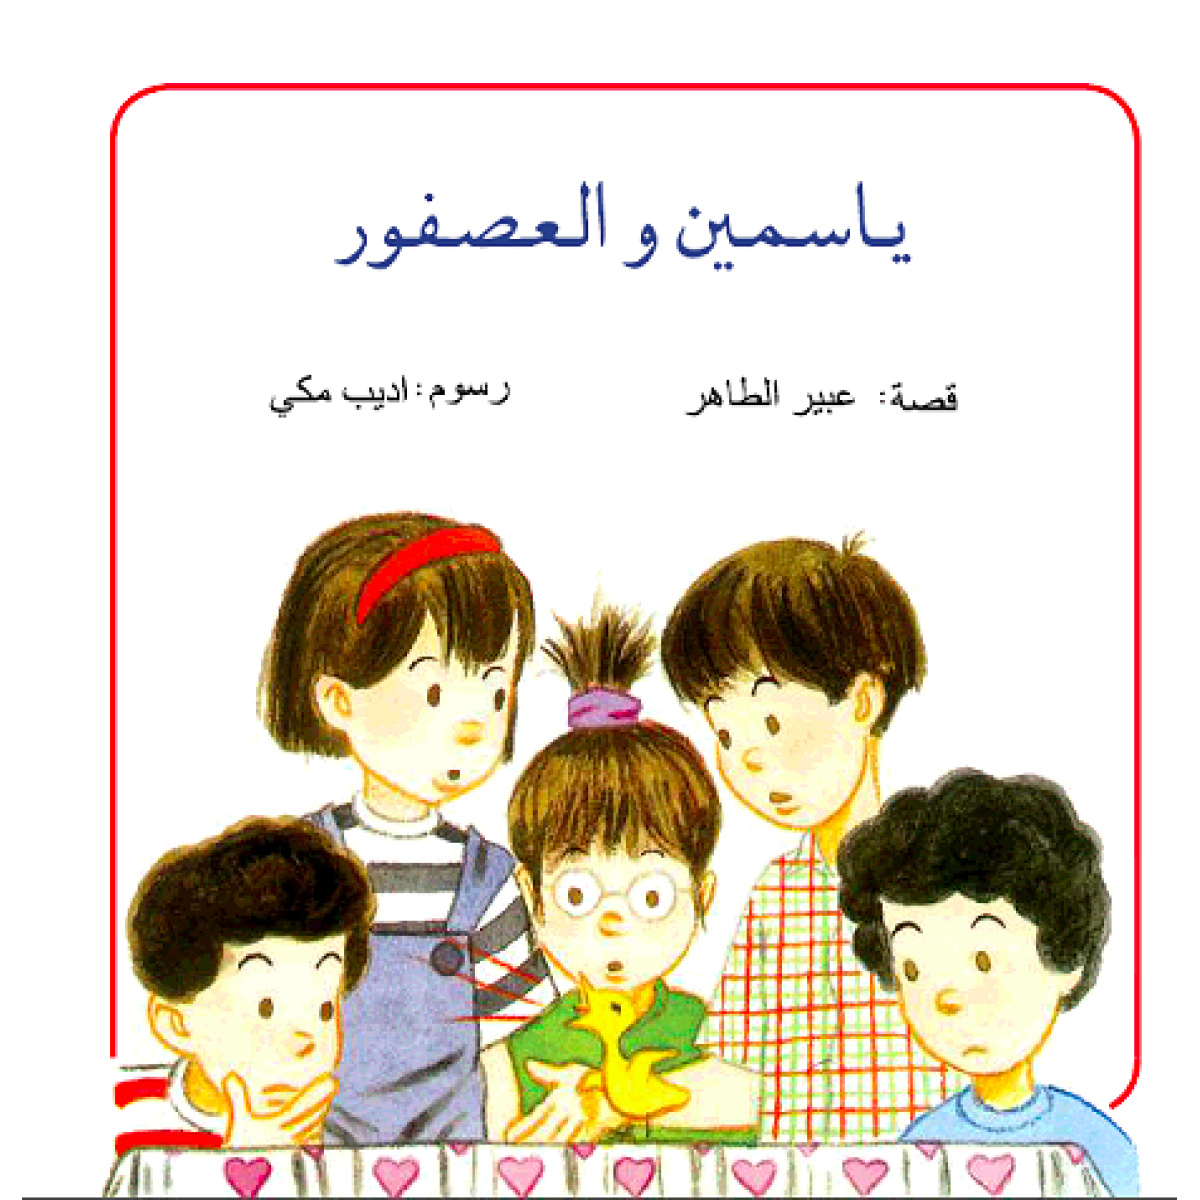 Yasmine and the Bird Dar Al Yasmine Publishing and Distribution